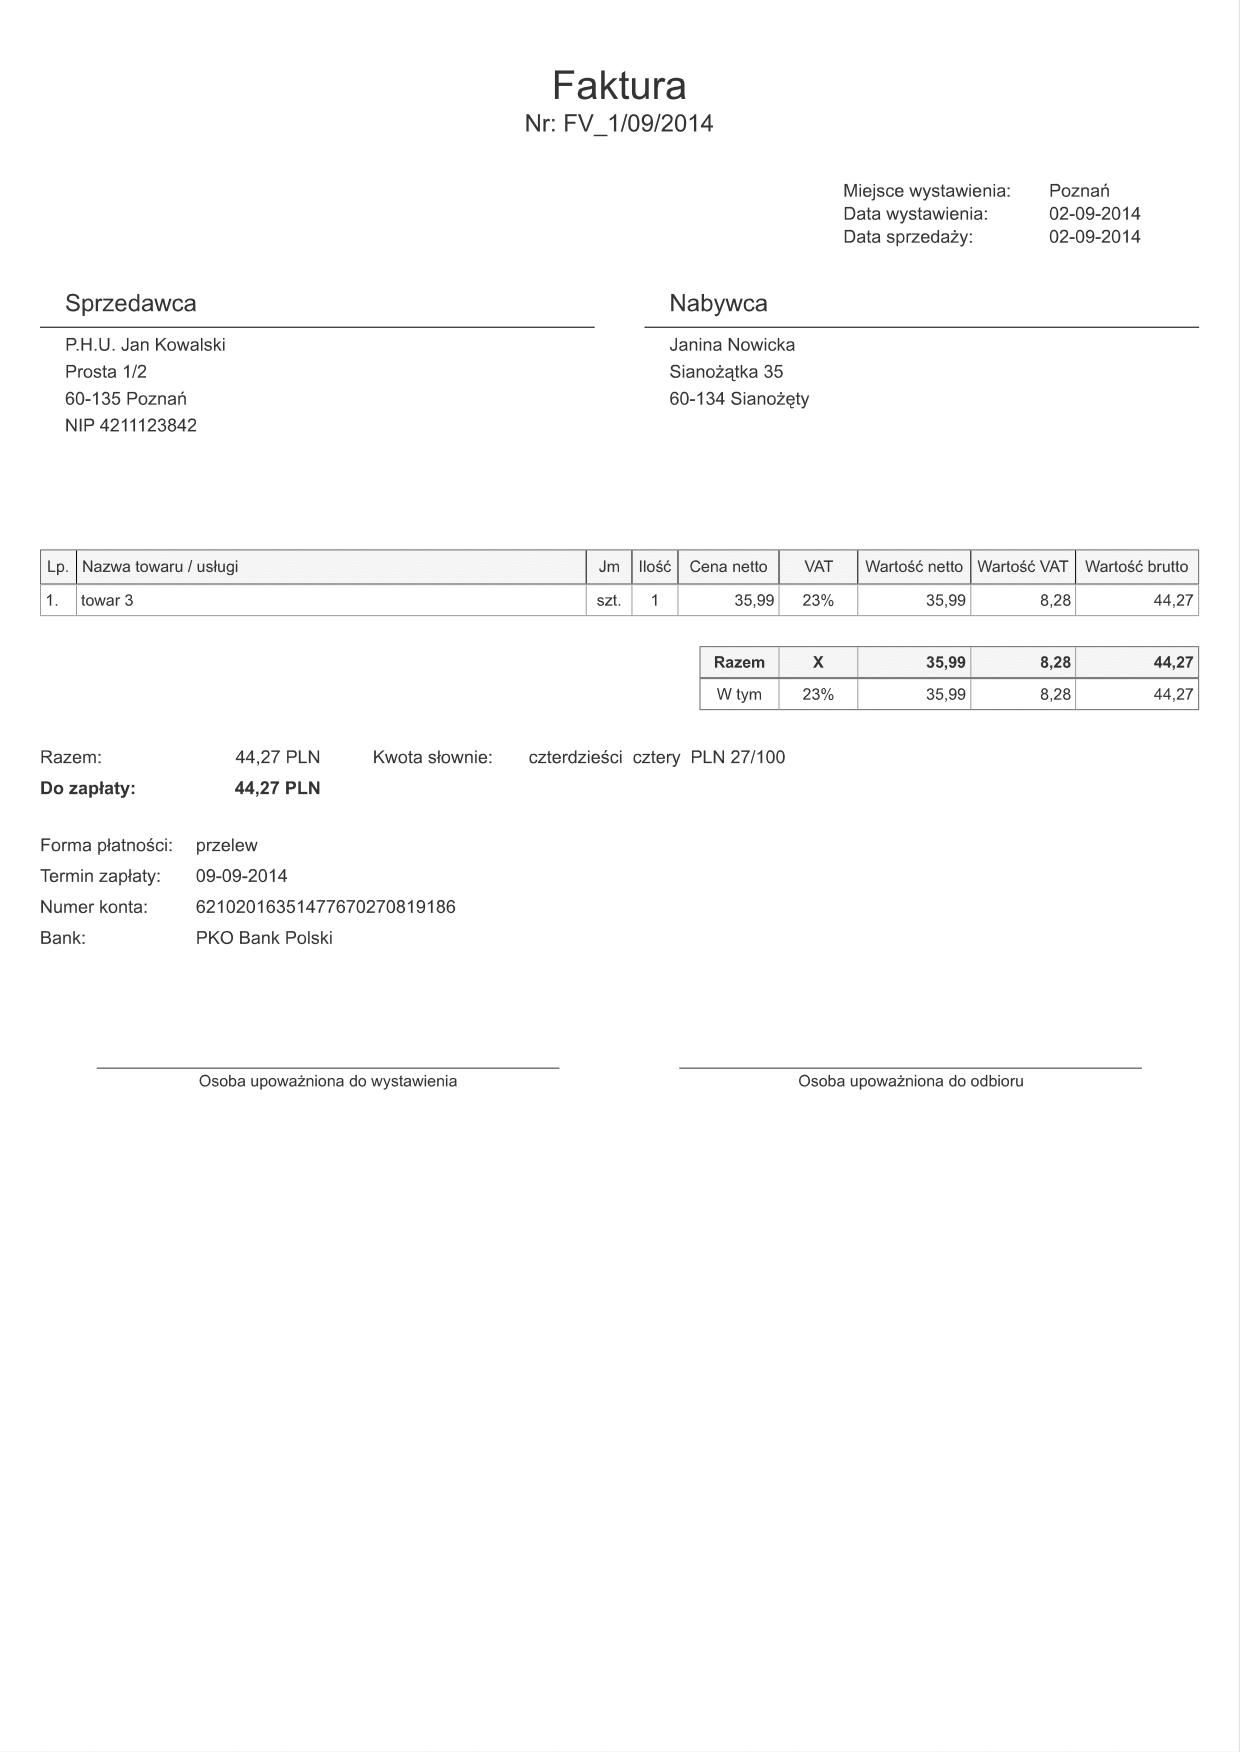 Fvatn 1poz Faktura Vat Netto 1 Druk Formularz Online